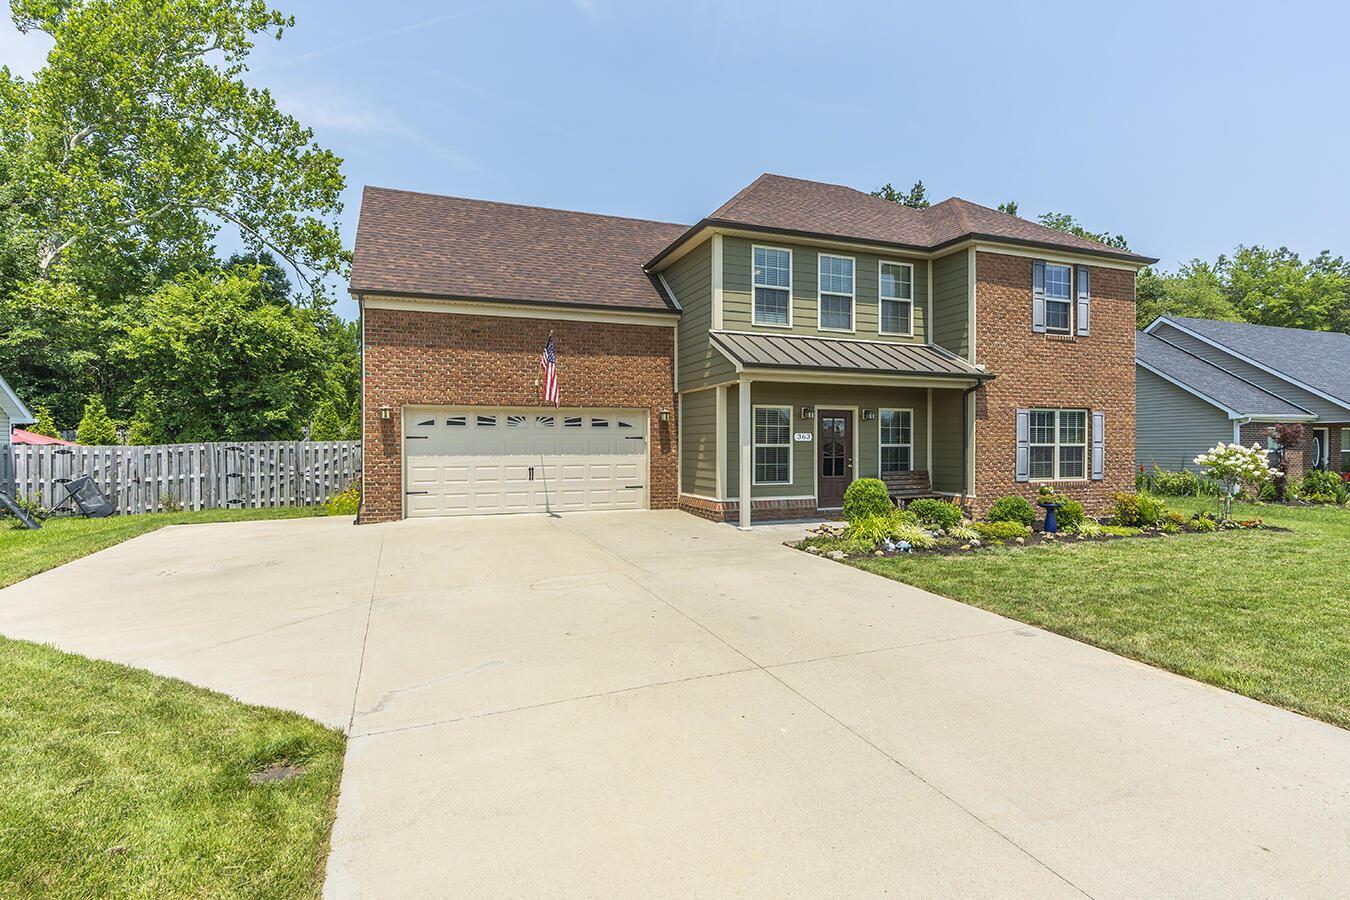 363 Lacey Mae, Richmond, KY 40475 - MLS#: 20114563